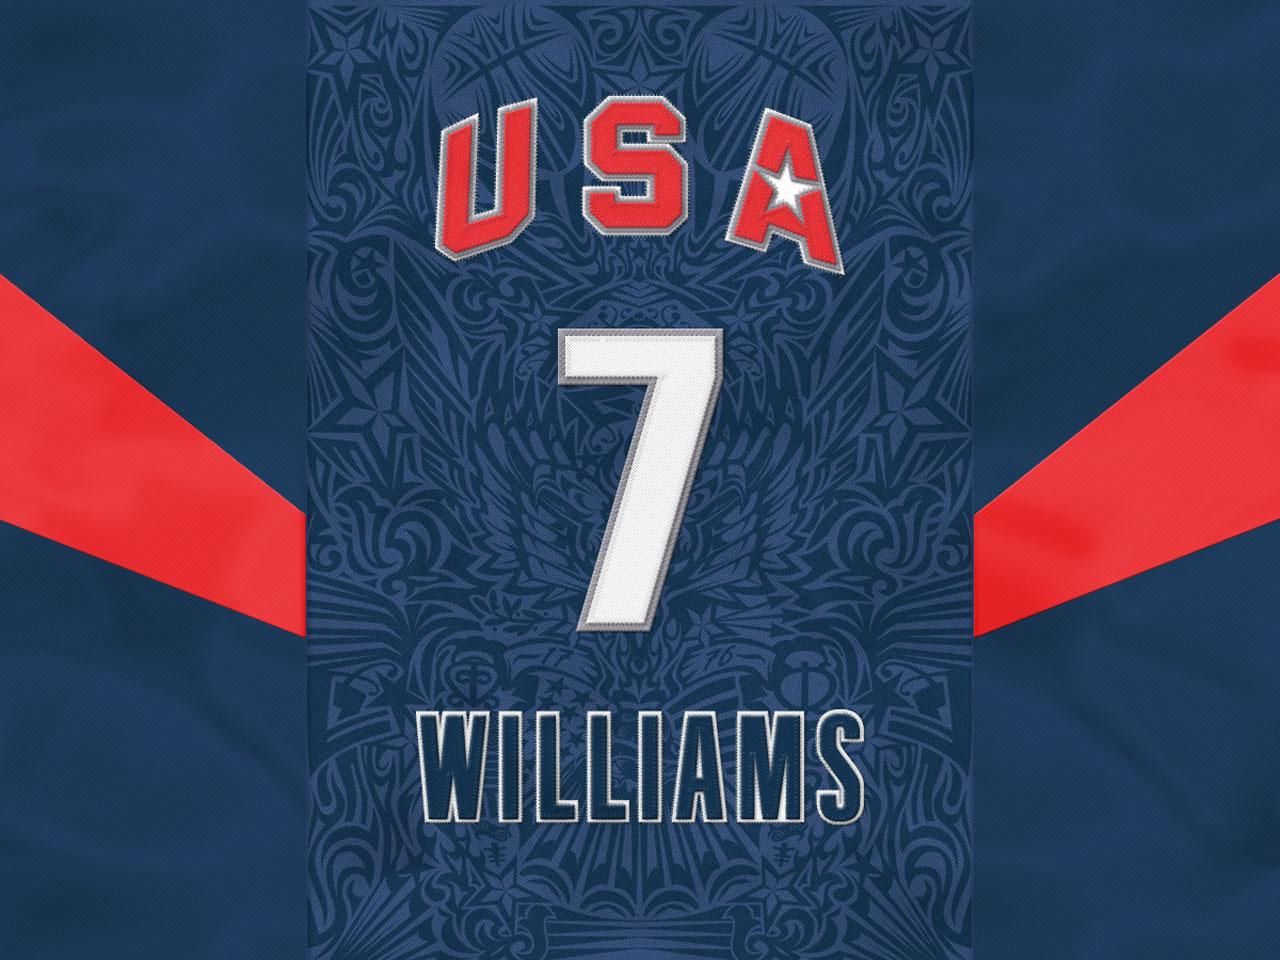 Team USA Wallpapers - WallpaperPulse